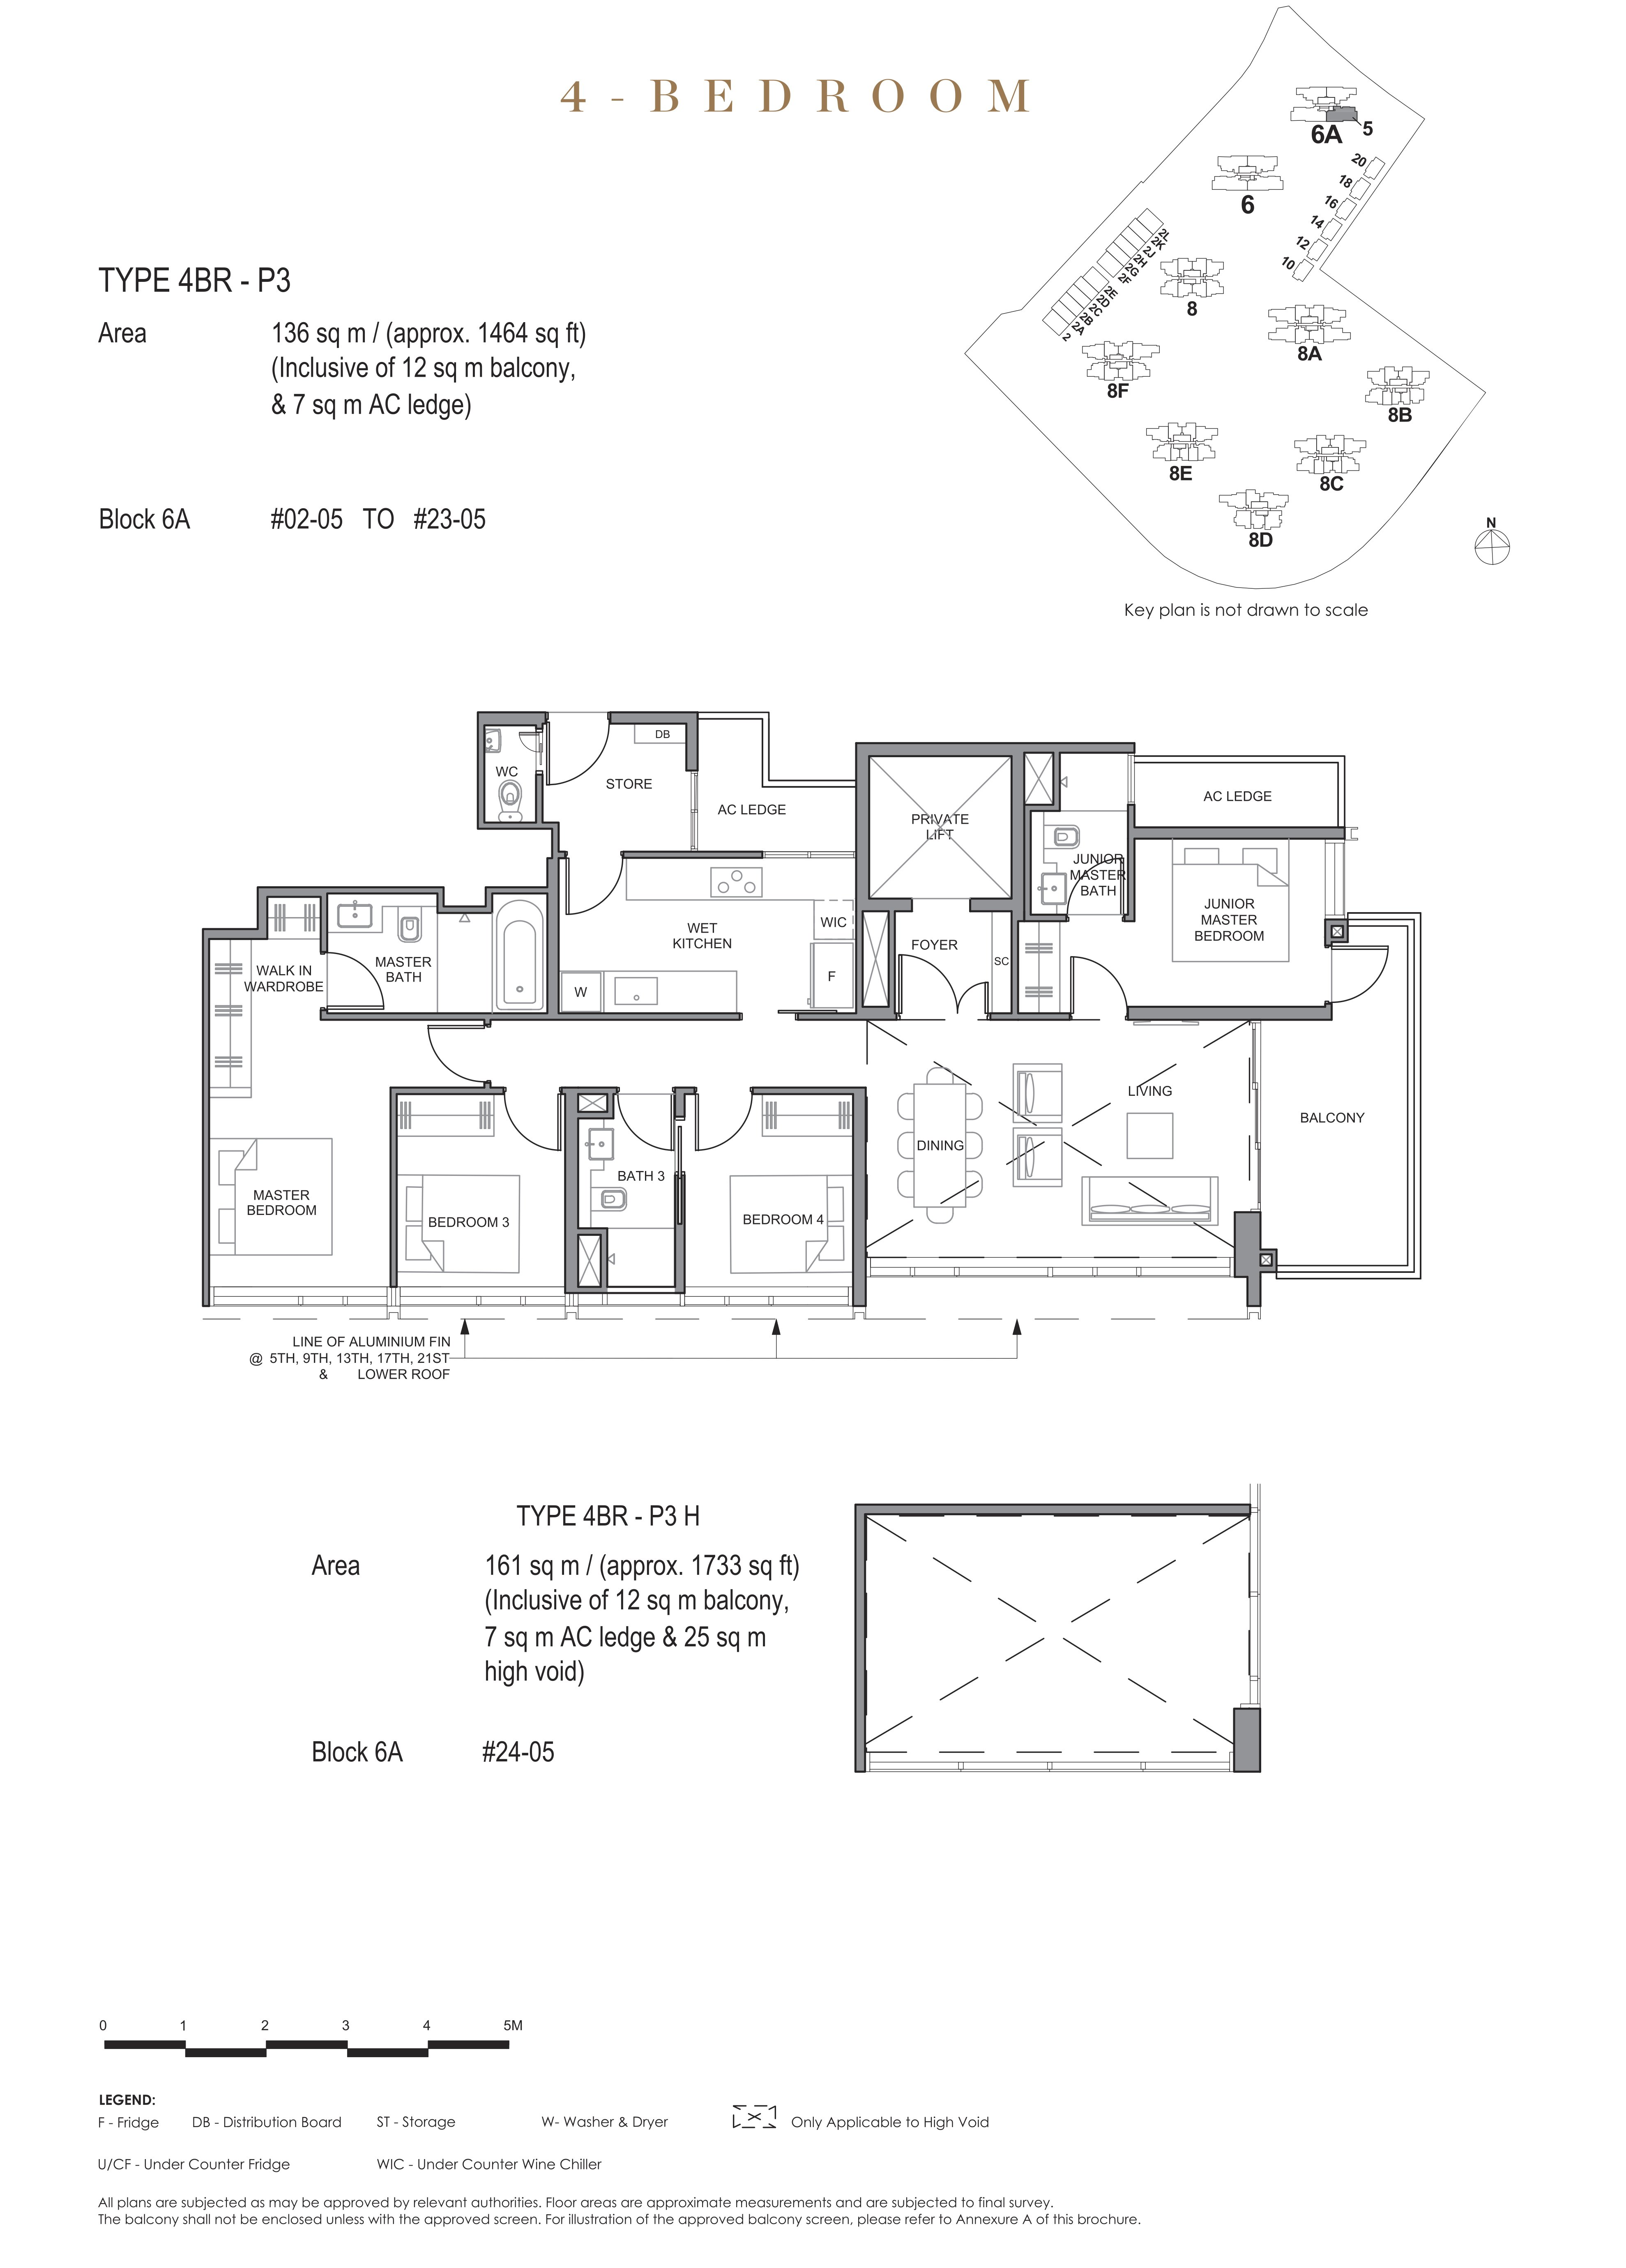 Parc Clematis 锦泰门第 signature 4 bedroom 4卧房 4BR-P3